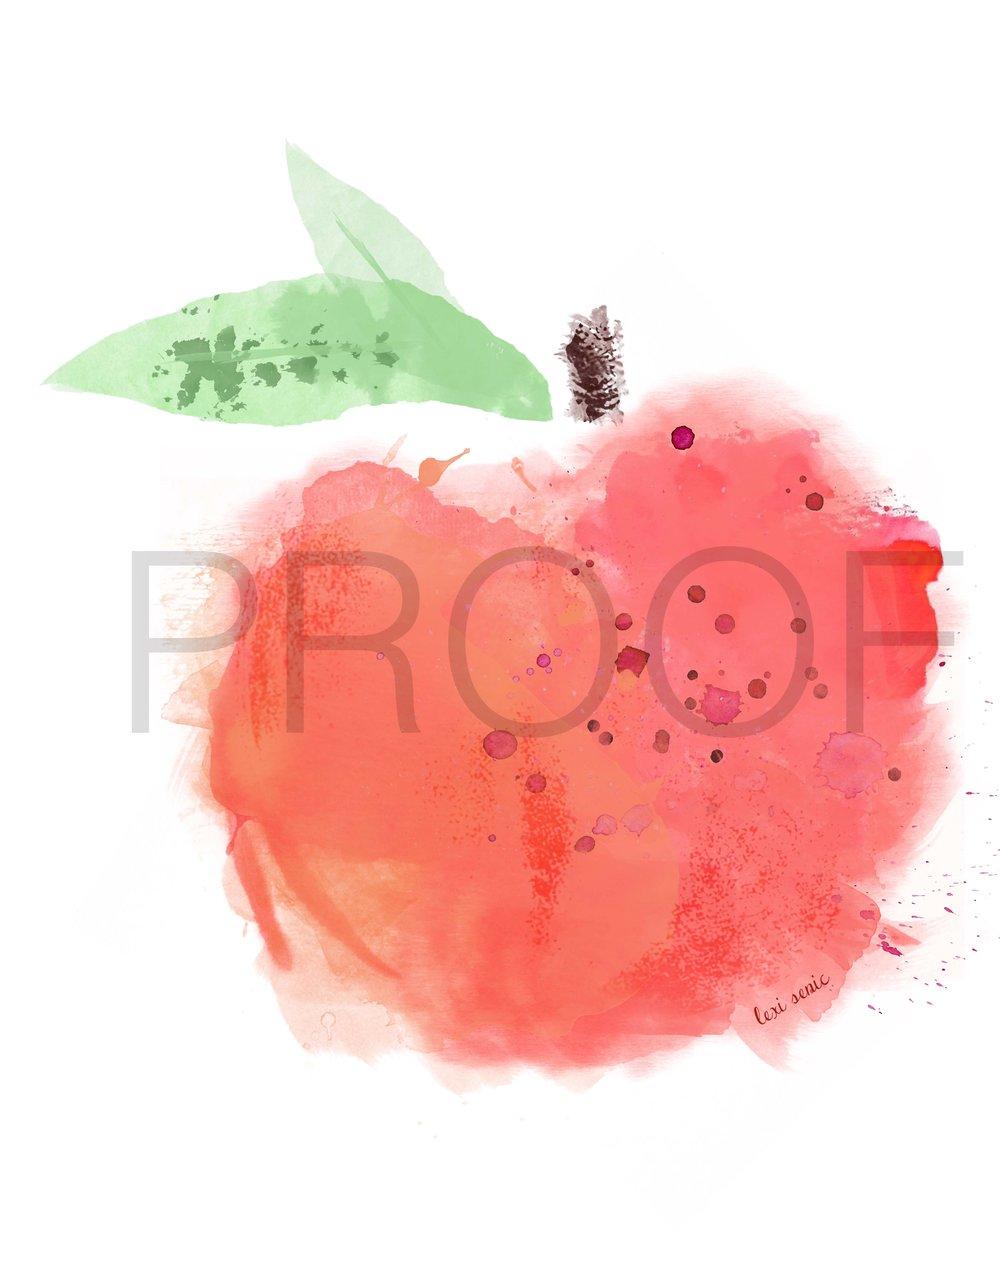 peach-basic-proof.jpg